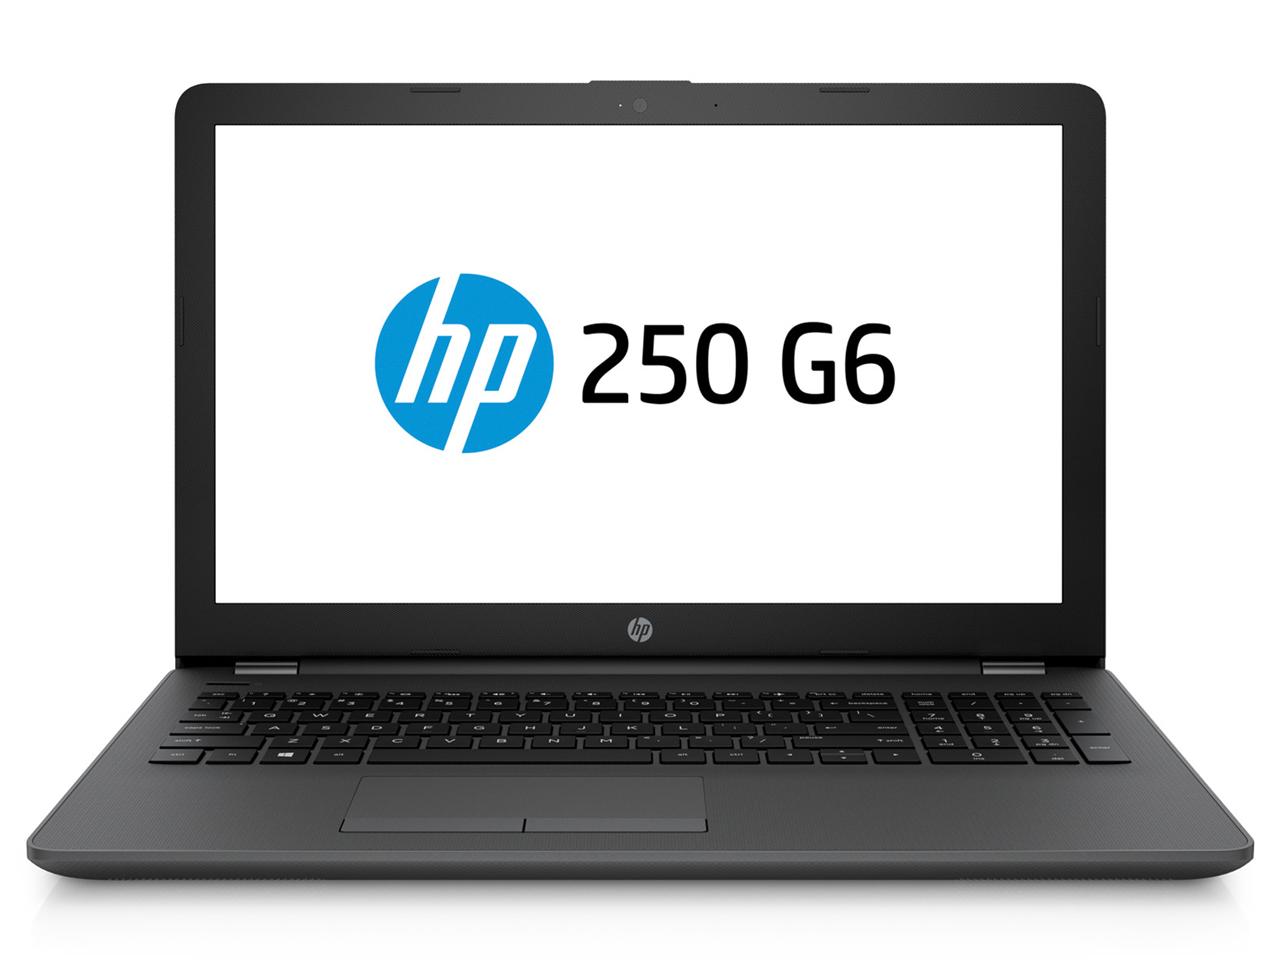 ★☆HP 250 G6 Notebook PC 4WD76PA-AAAK (15.6 / Windows 10 Home / Core i3 7020U / 500GB /4GB / DVD-SM)